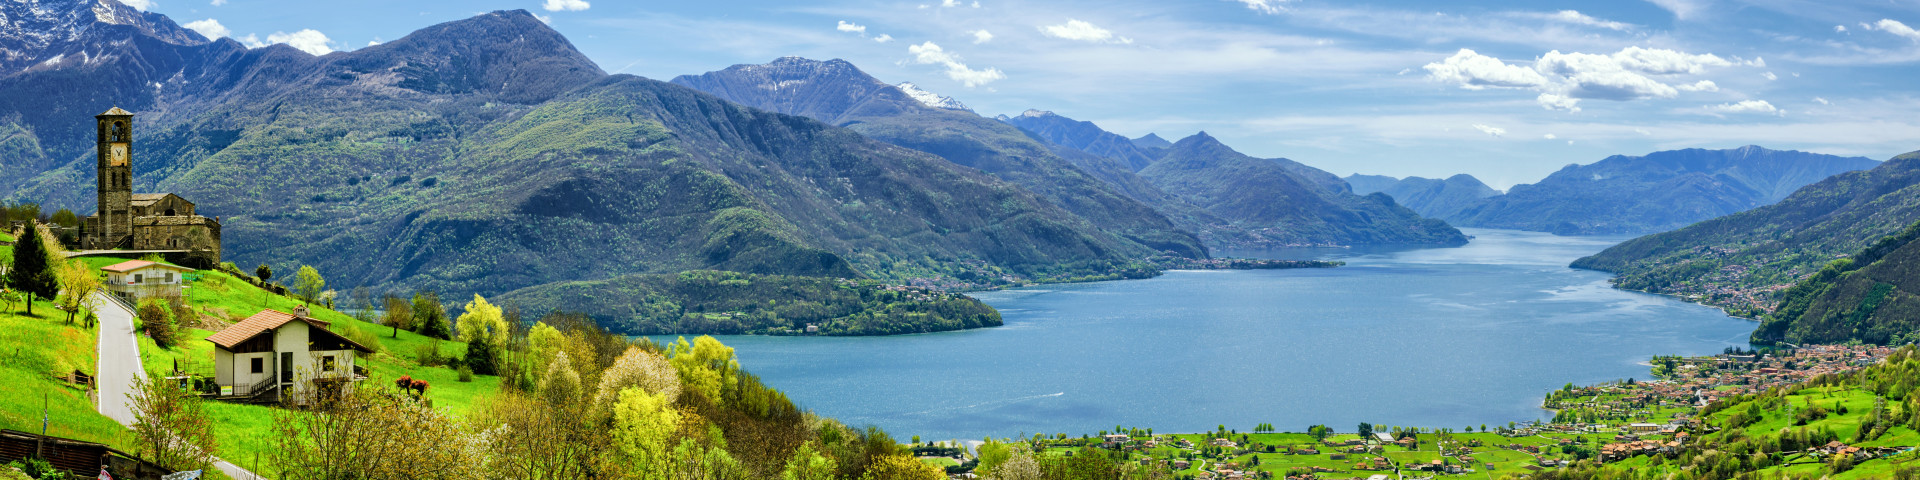 pohled na jezero z kopce Peglio